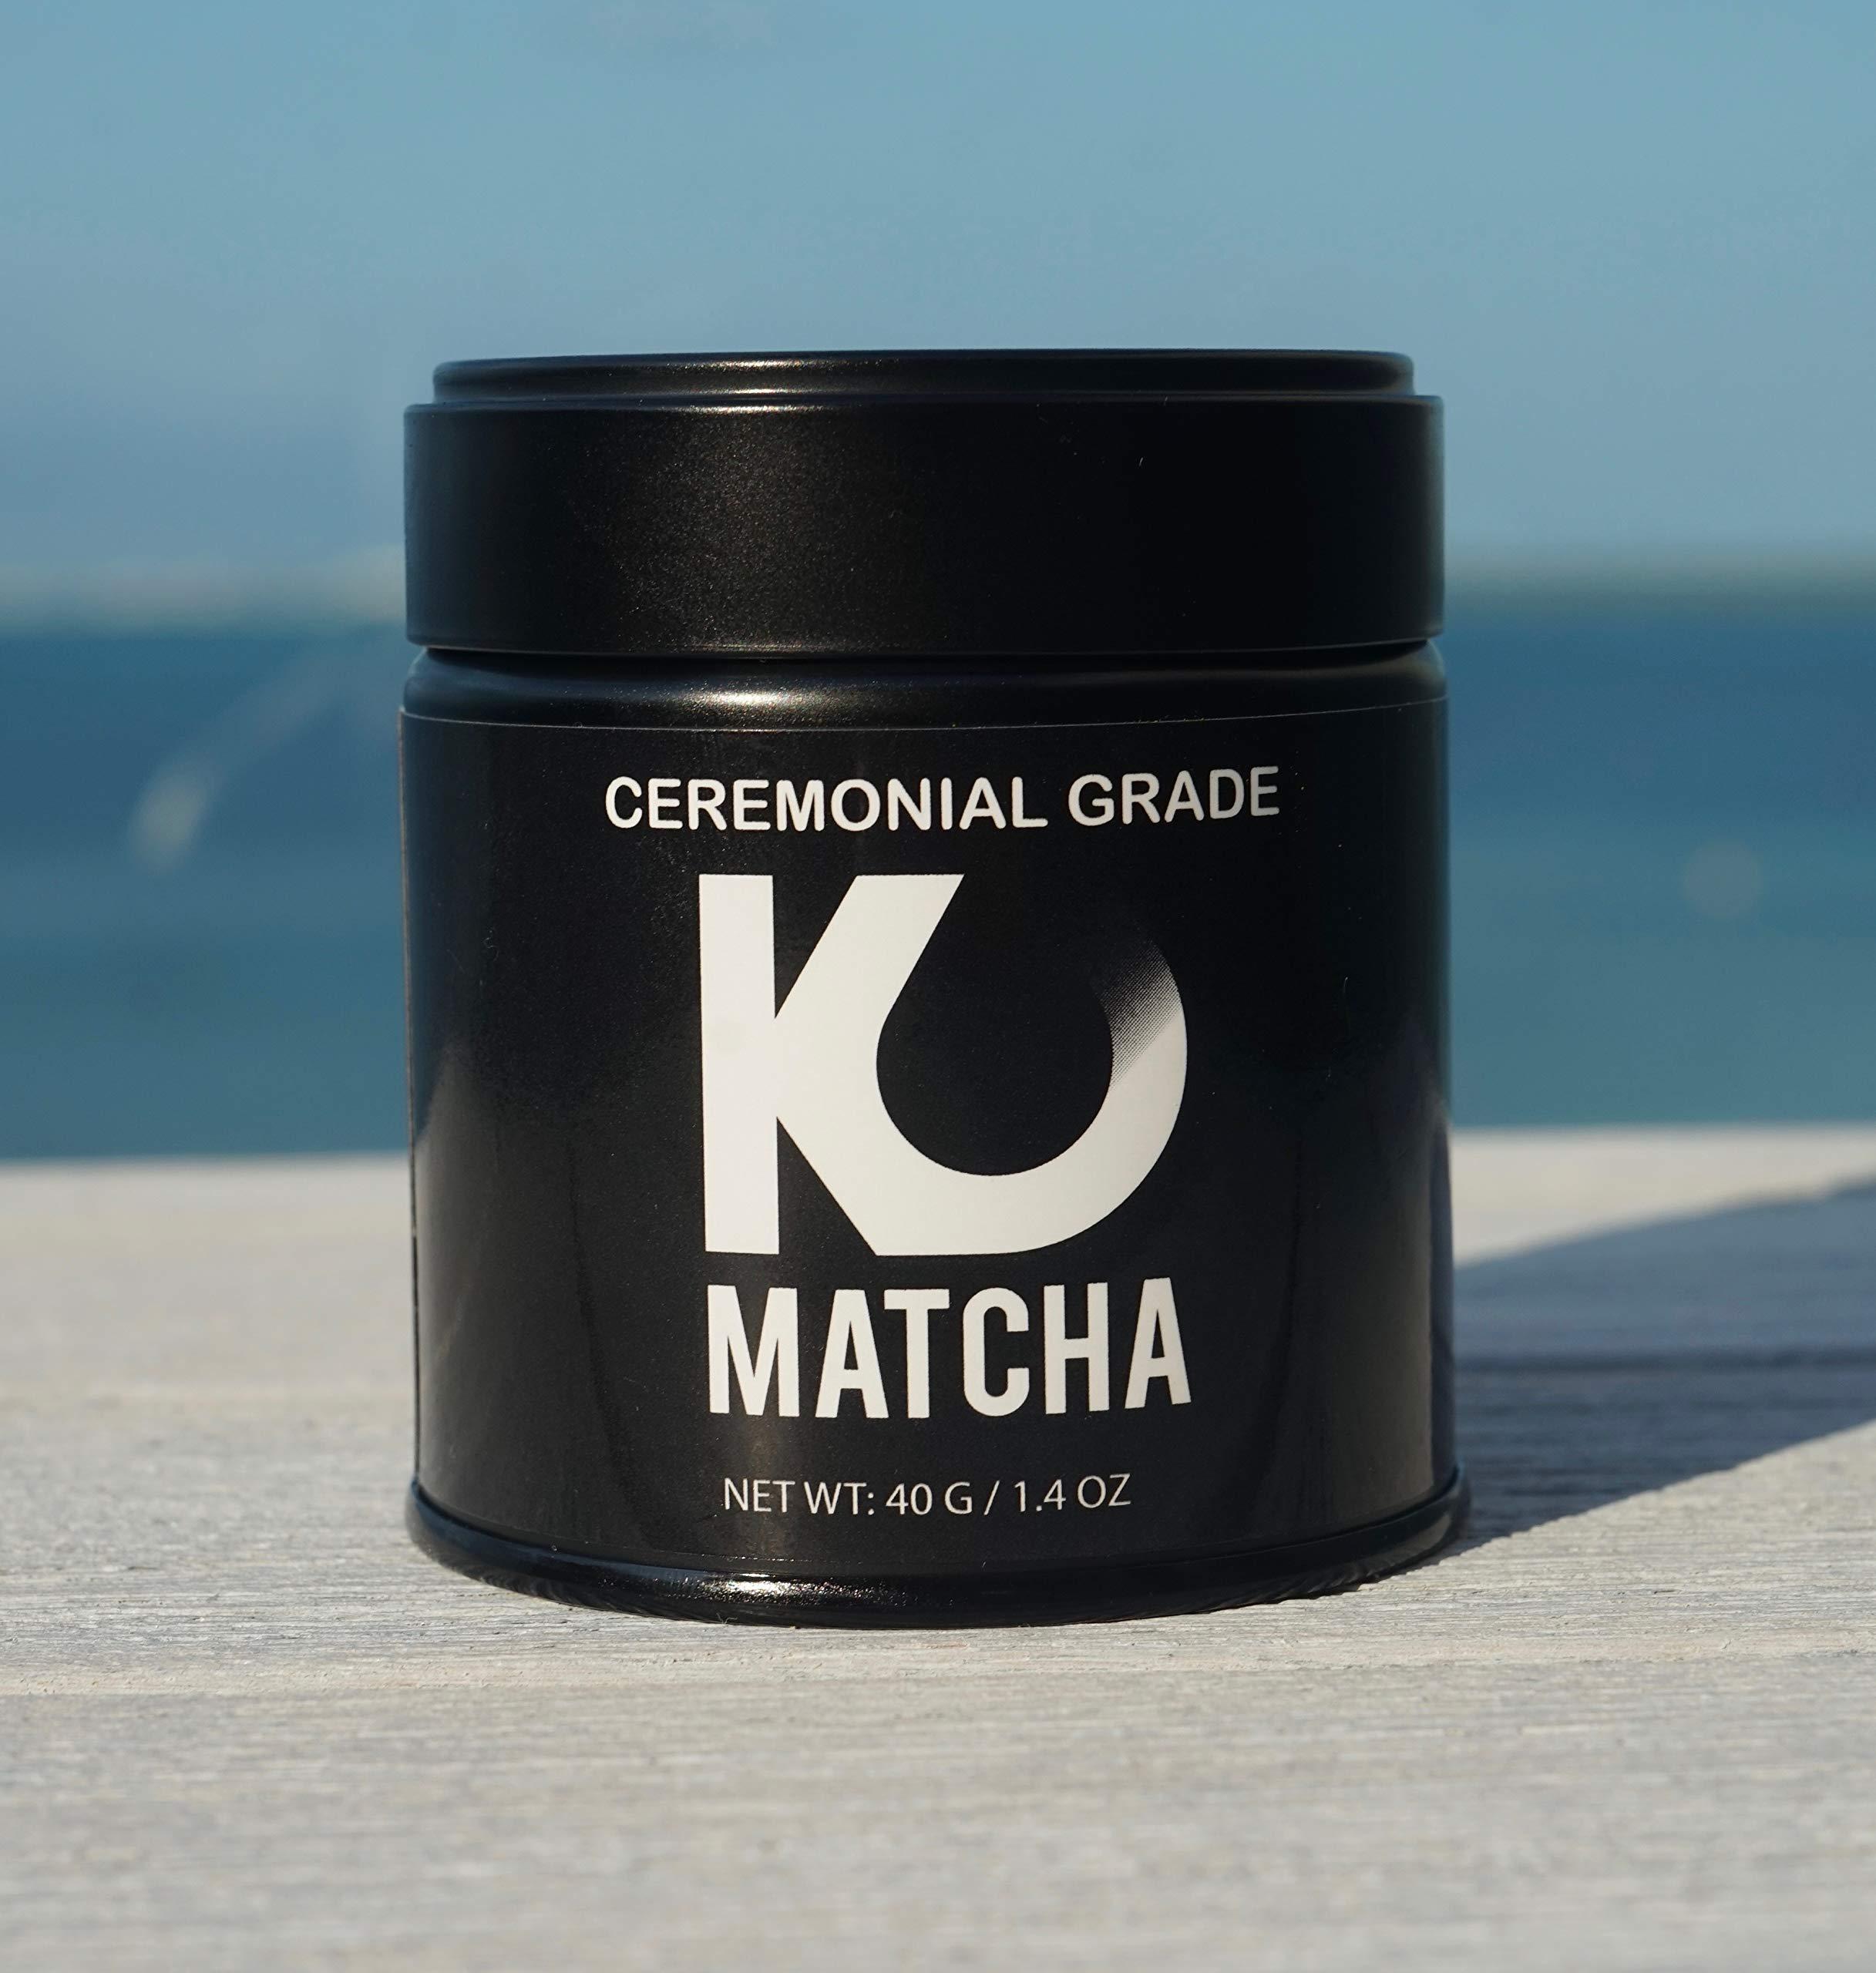 KO Matcha Ceremonial Grade by KO Matcha